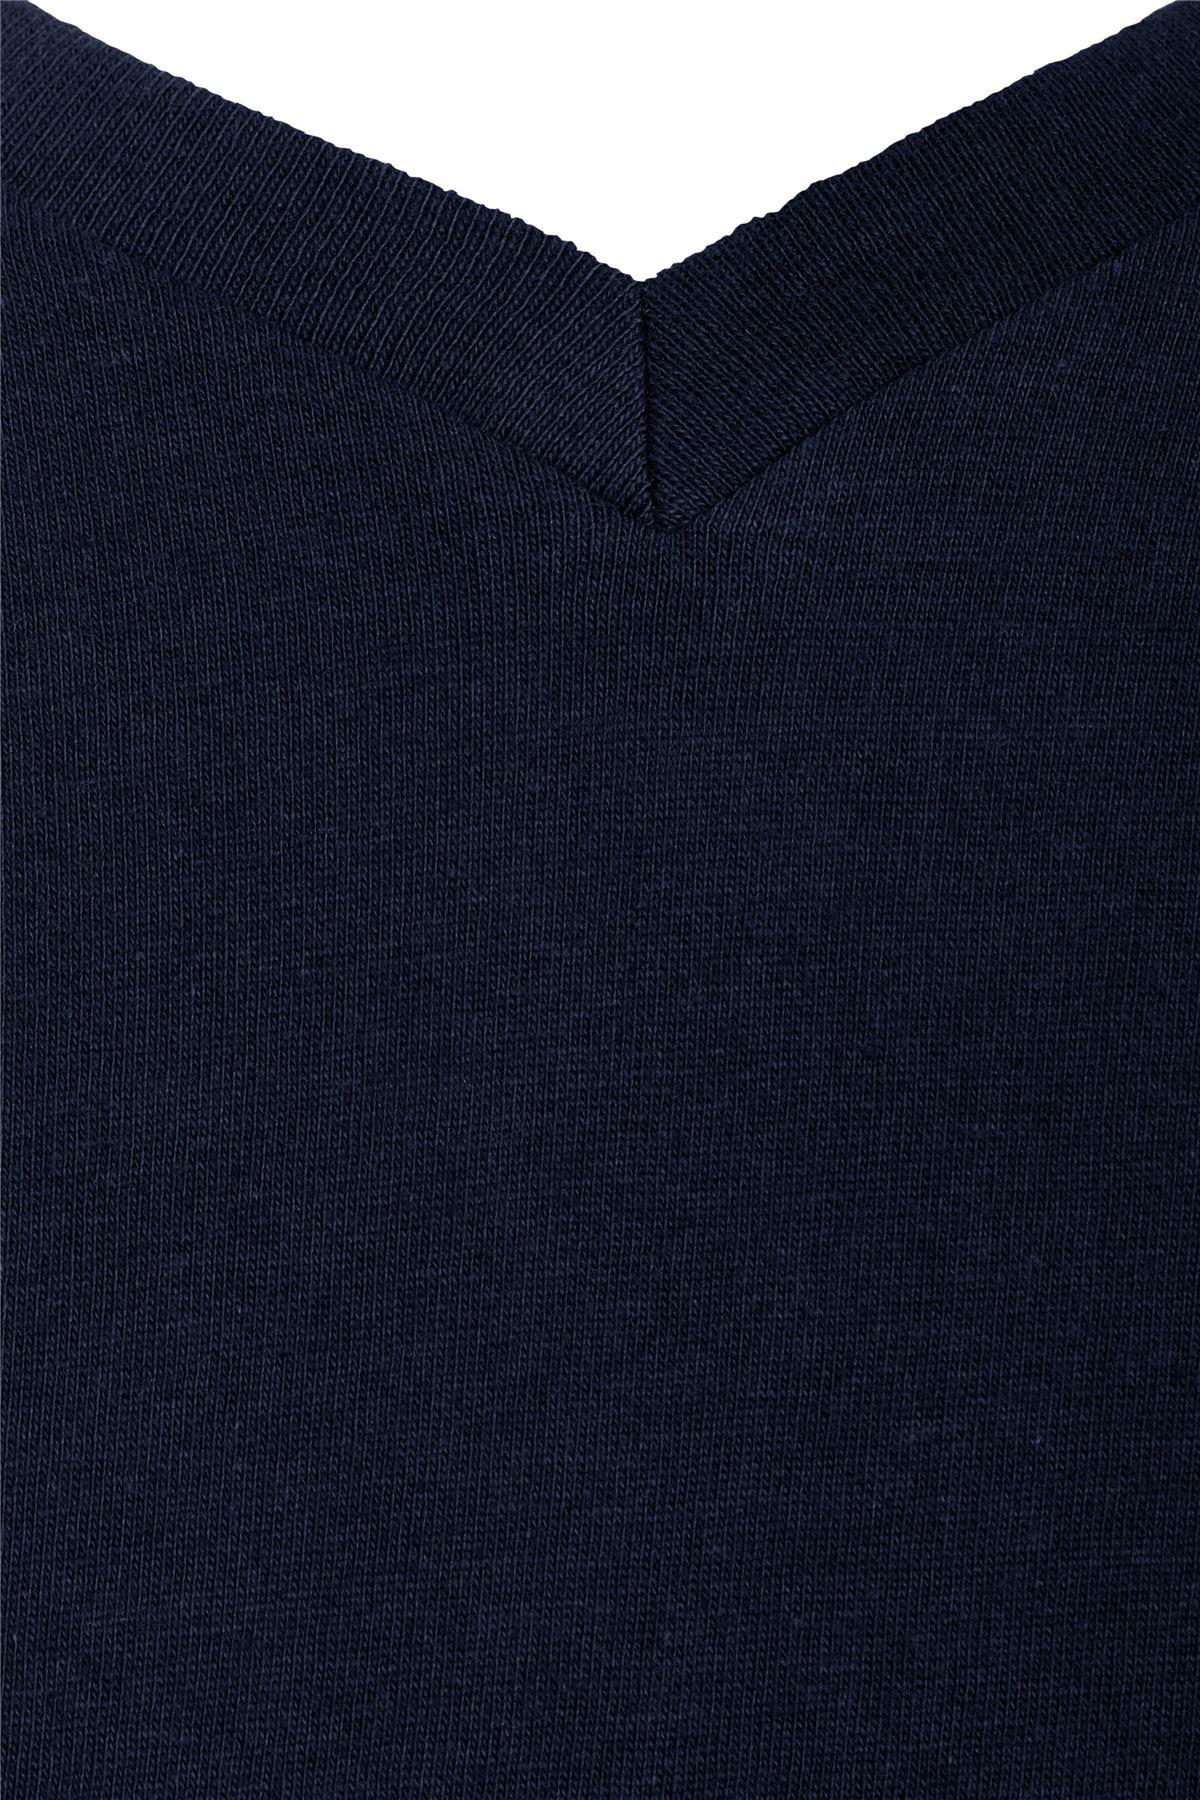 Mens V Neck Cotton Comfortable Regular Soft Short Sleeve Casual Tshirt Top Tee